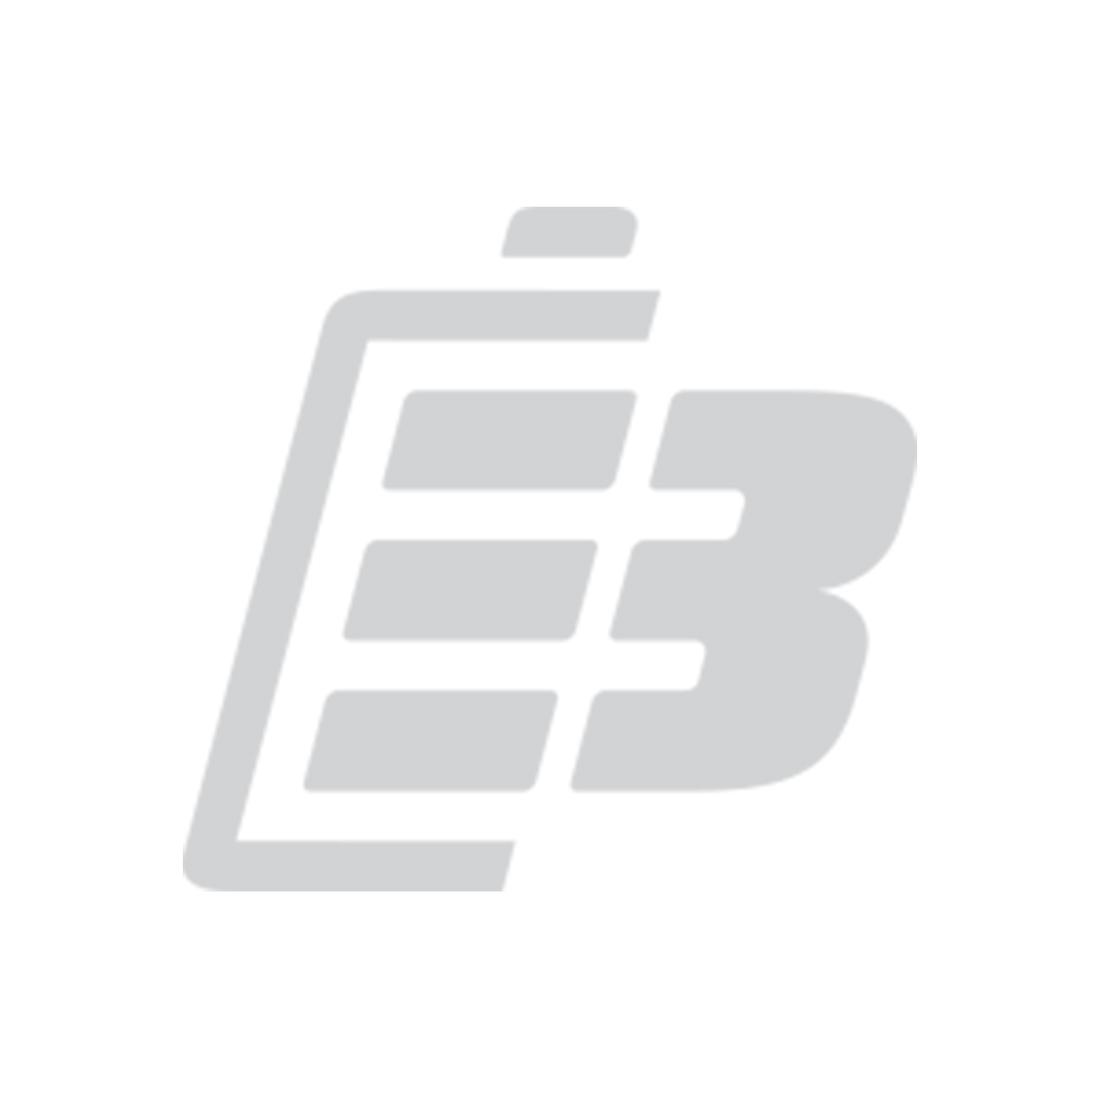 Smartphone battery Samsung Galaxy Note_1